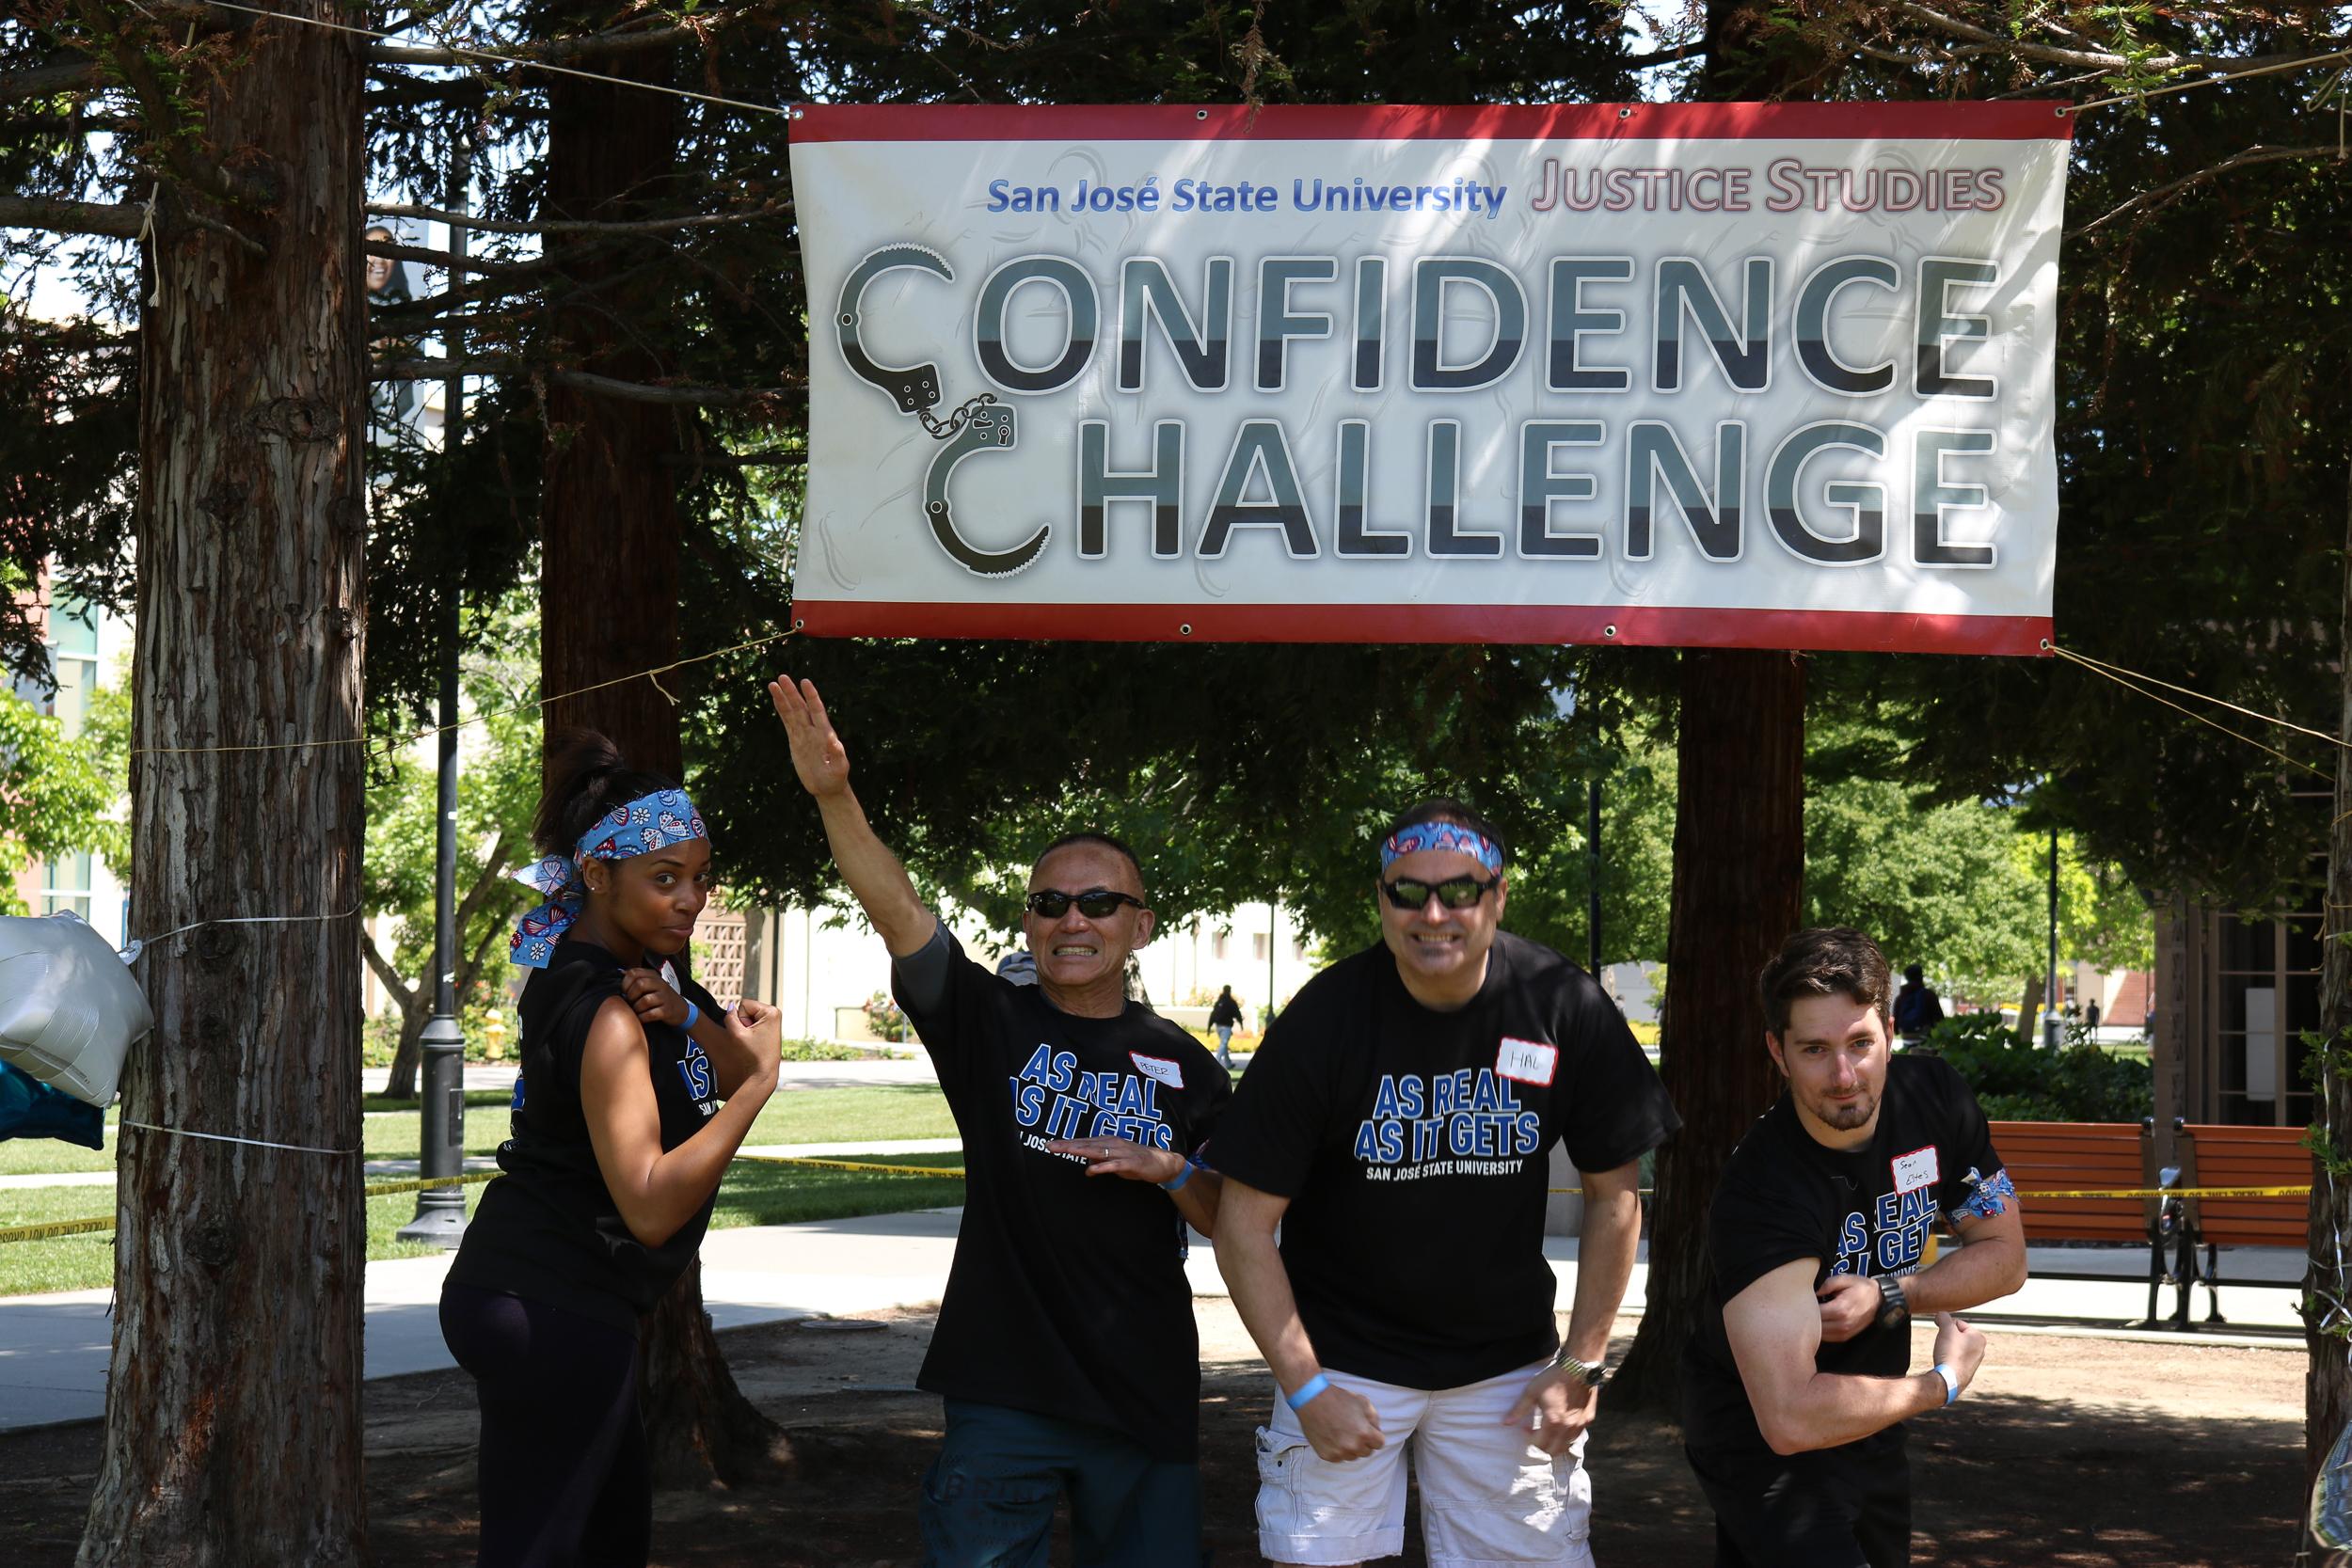 042817_Confidence_Challenge_Kameda-5.jpg